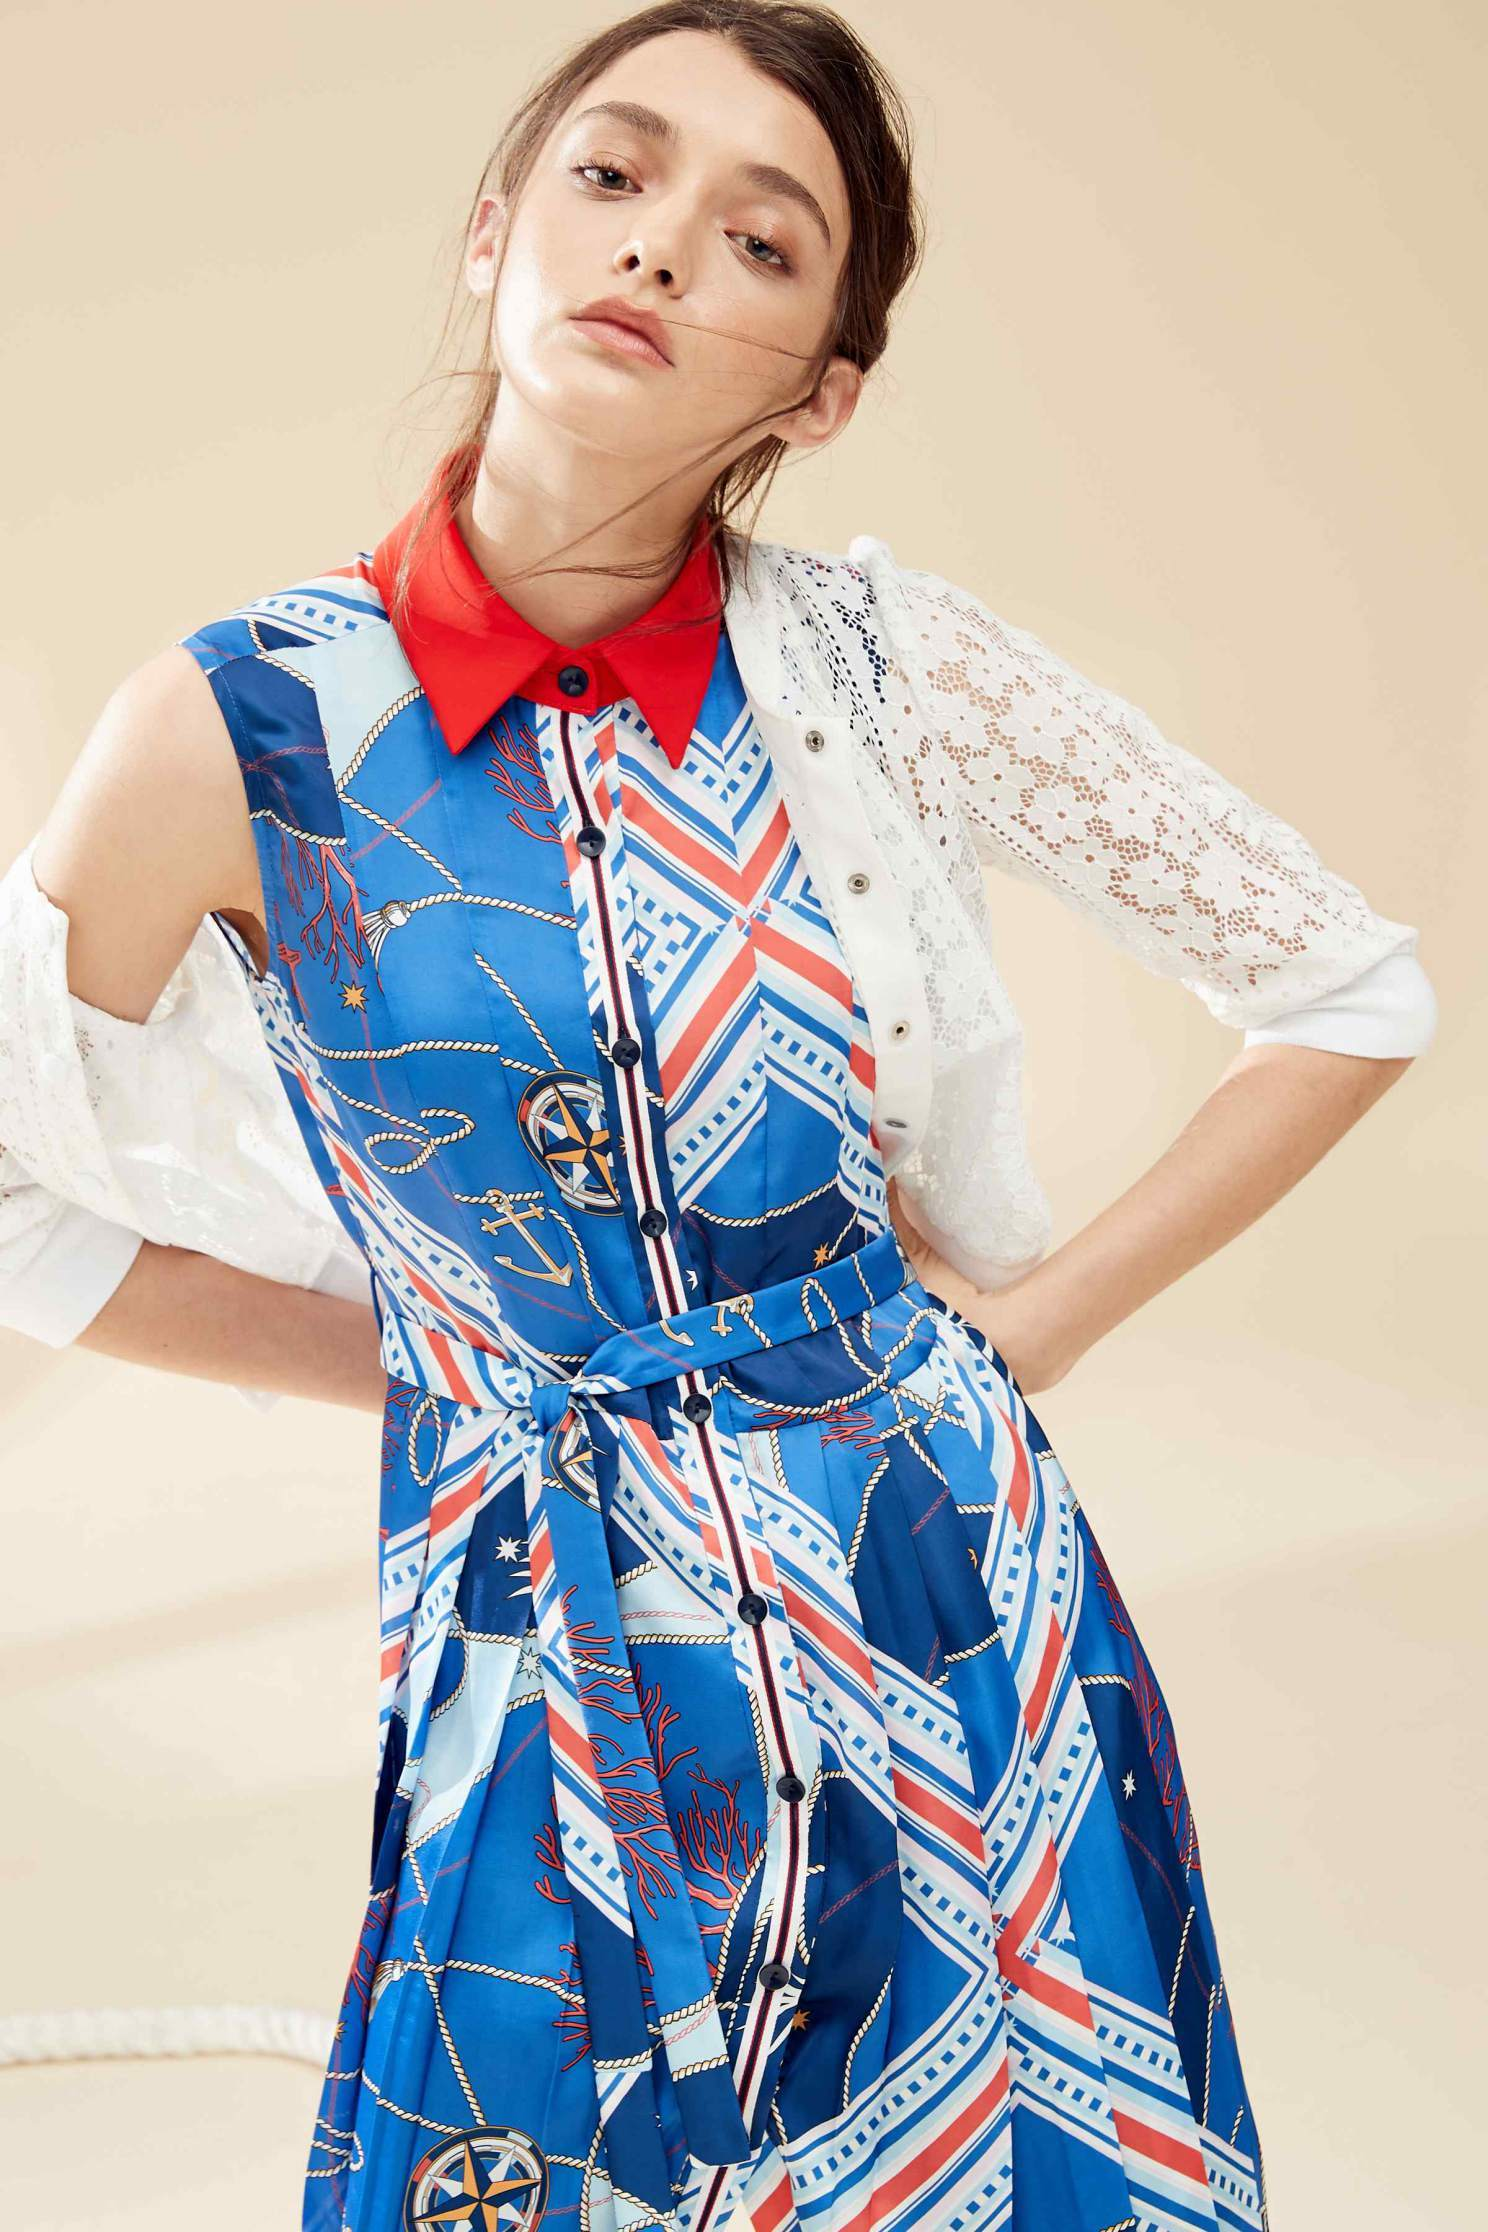 Ocean sytle fashion dress,casualdress,printeddress,firesigns,sleevelessdress